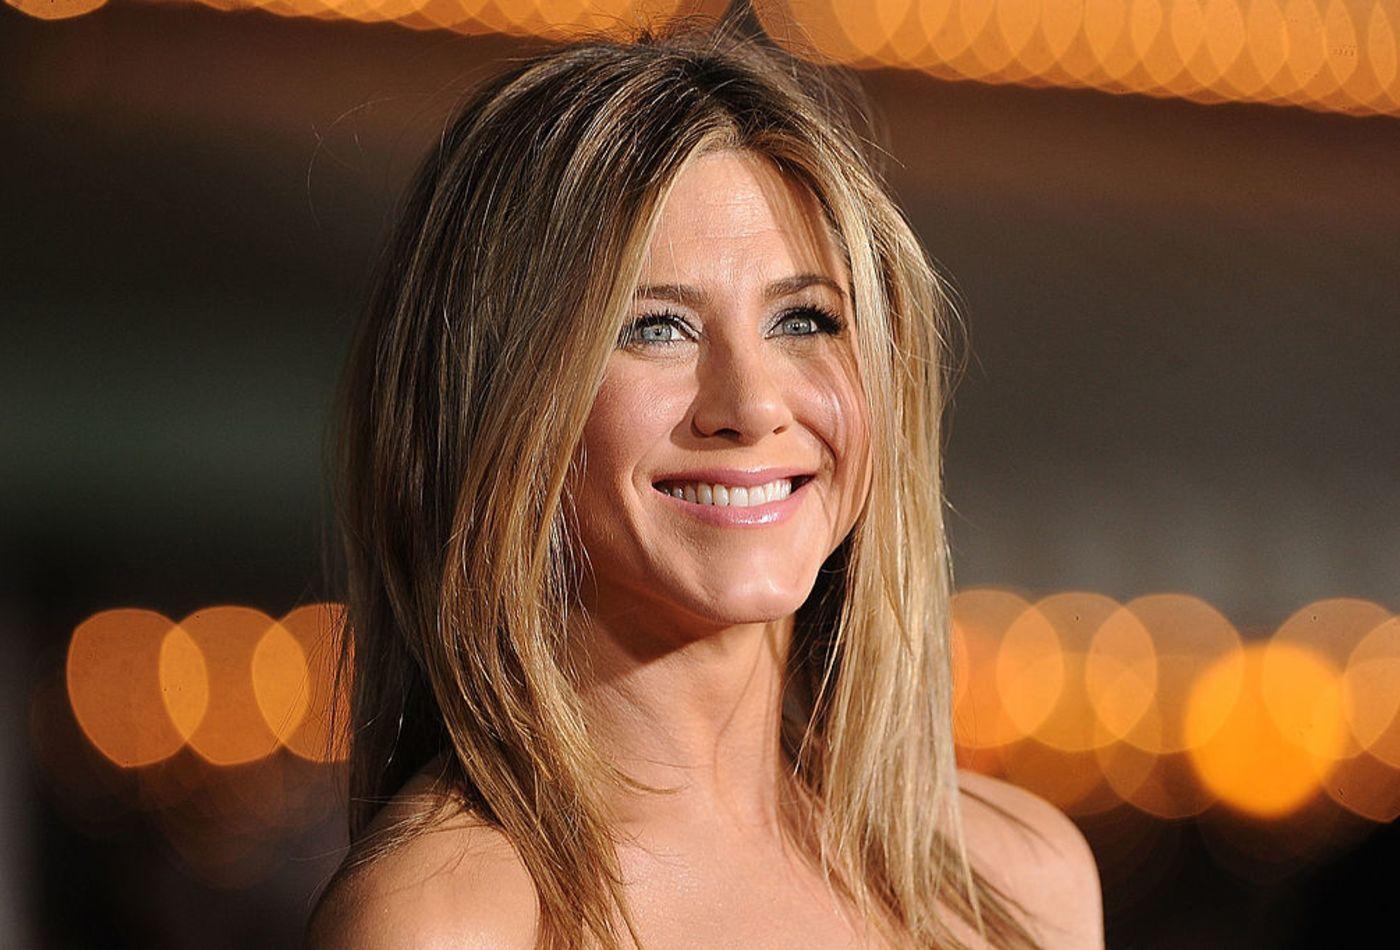 H Jennifer Aniston είναι επιτέλους στο Instagram